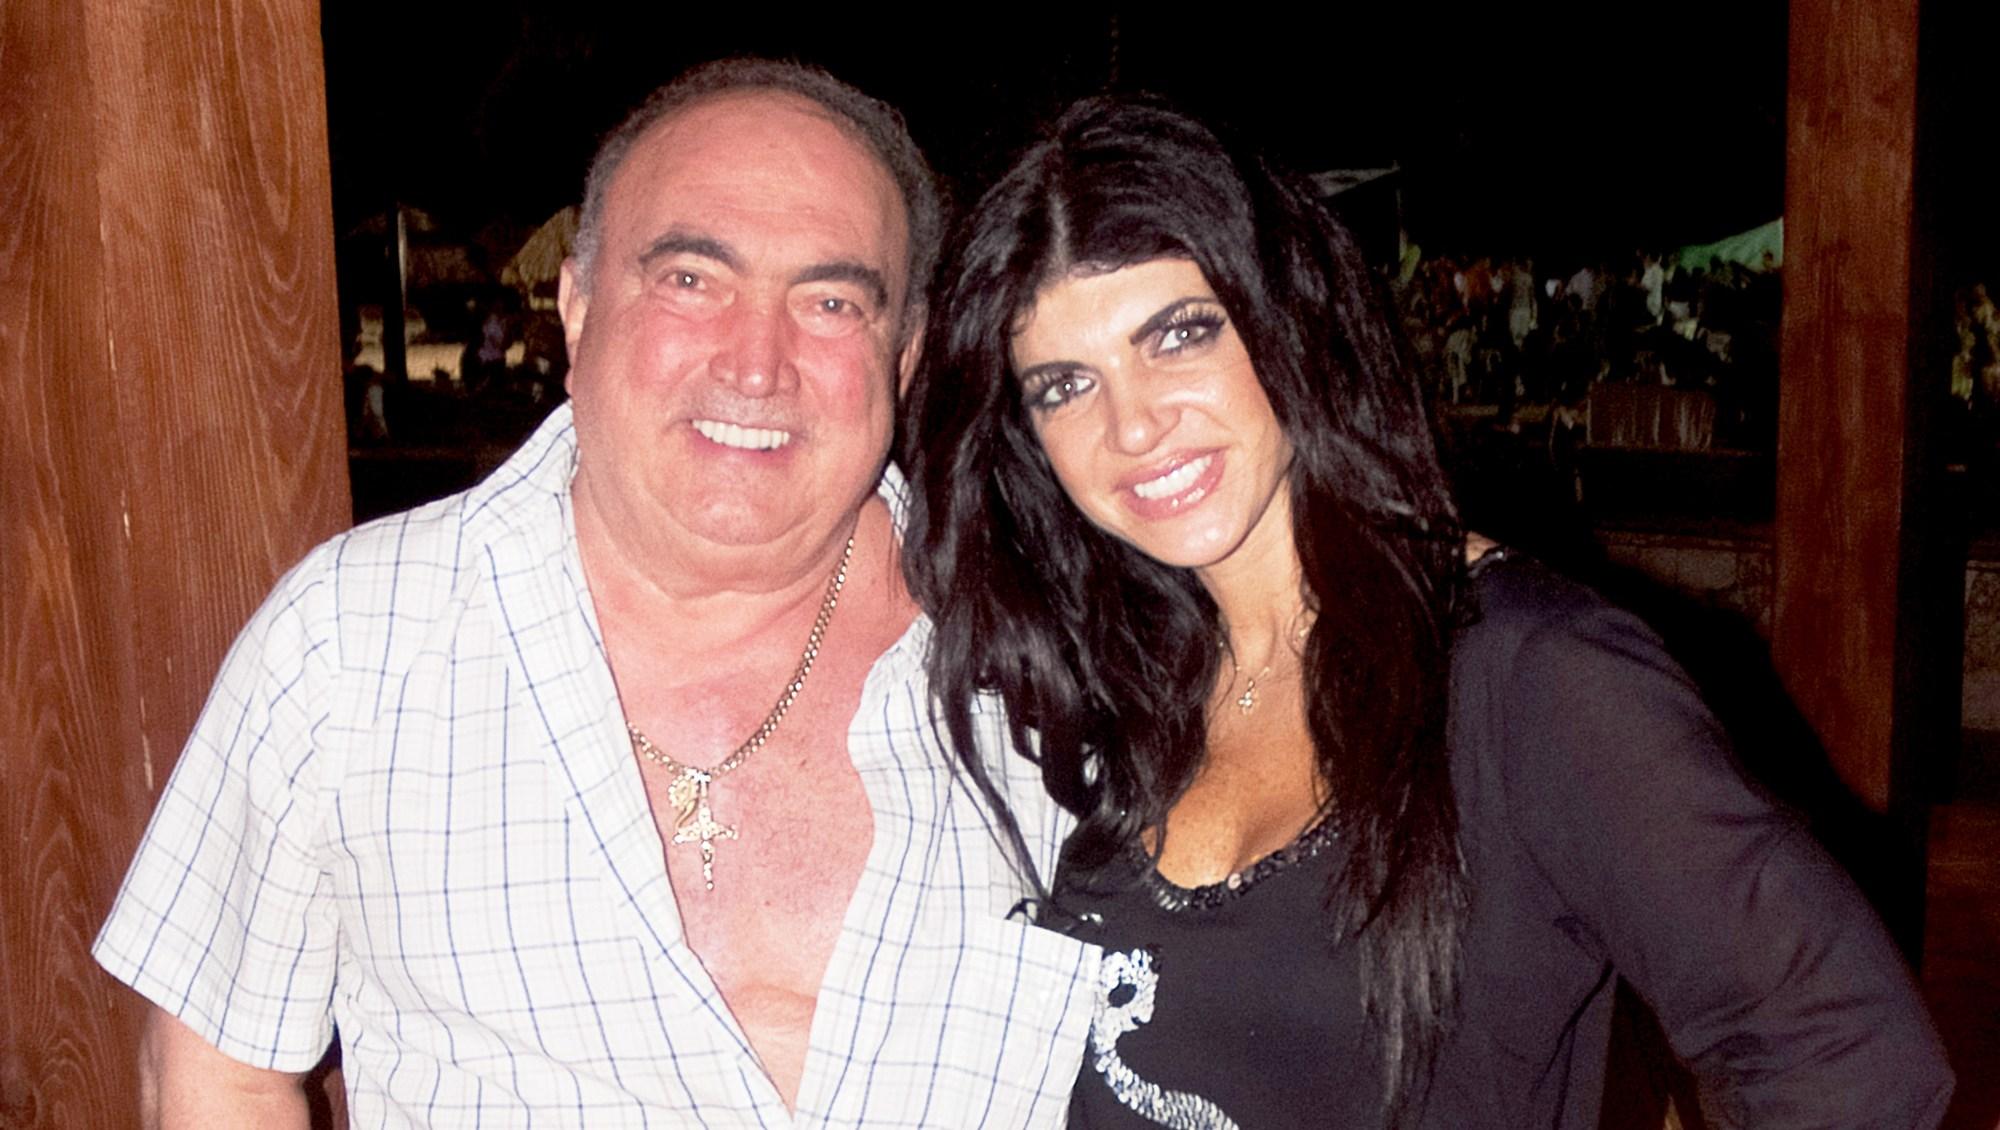 Teresa Giudice and Giacinto Gorga at the Majestic Resort on March 3, 2013 in Punta Cana, Dominican Republic.